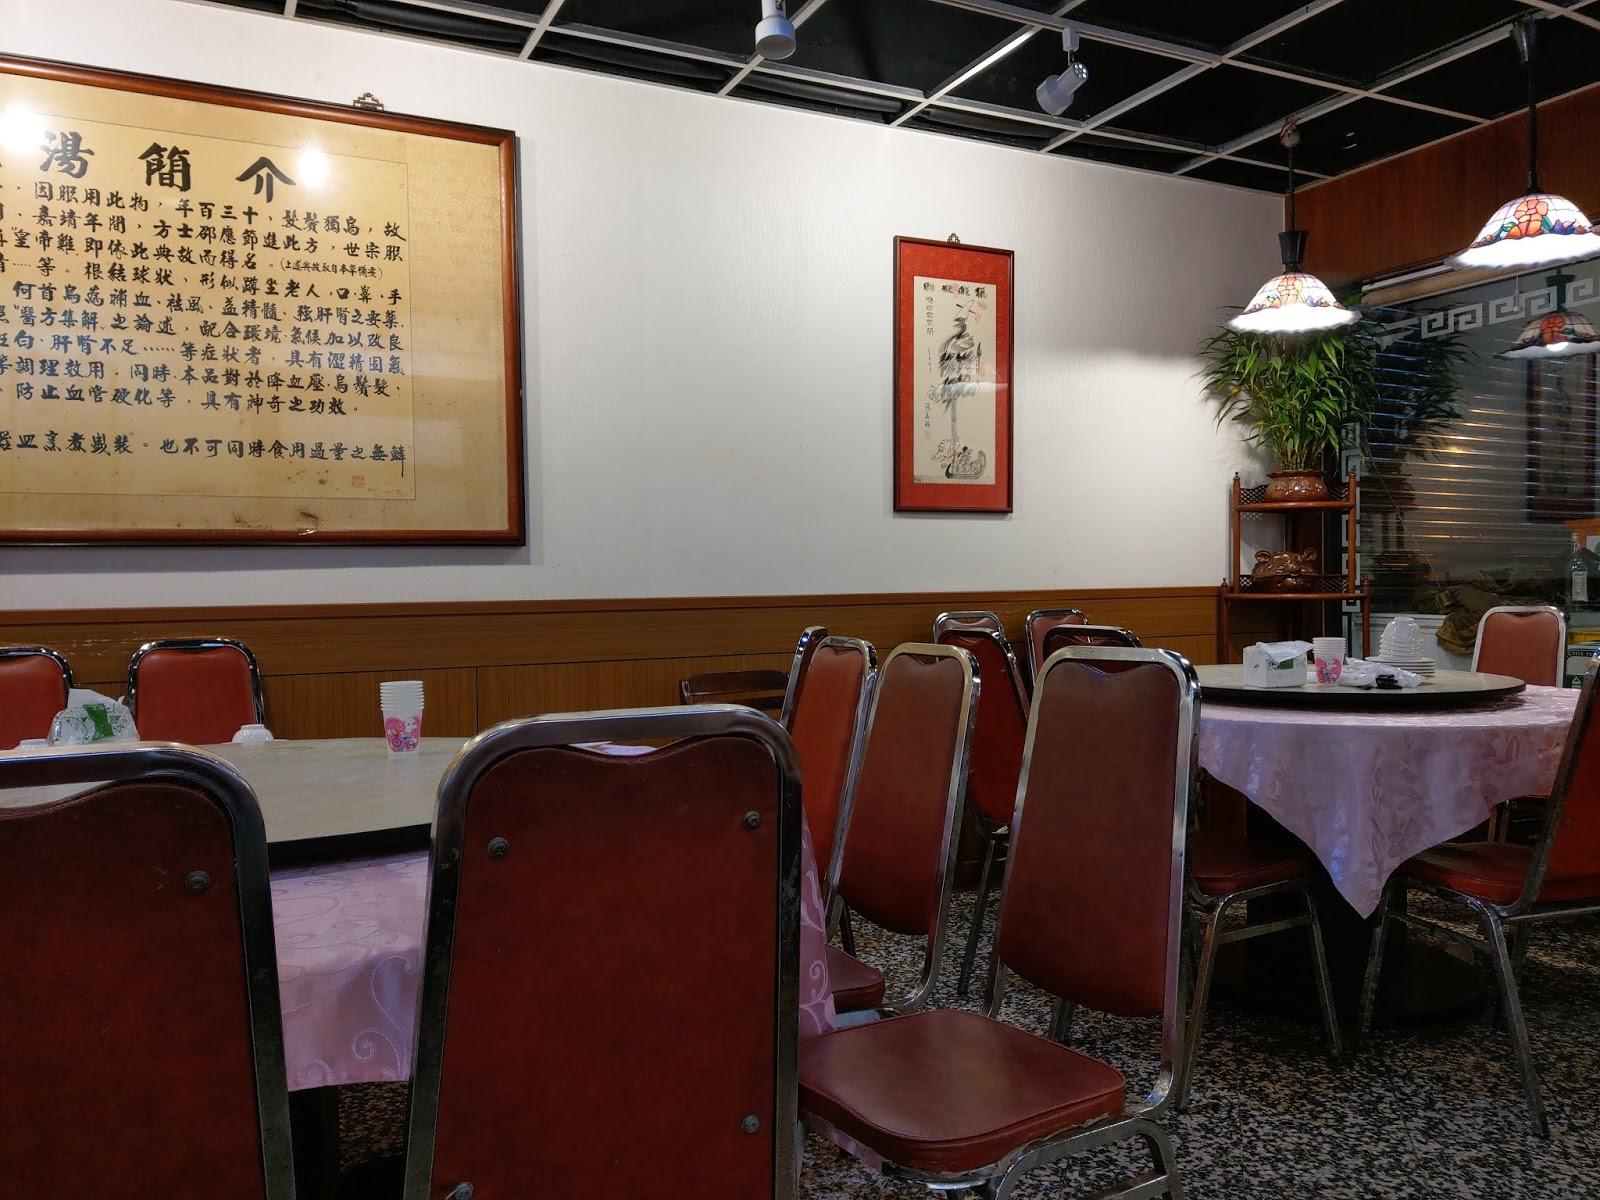 larle的懶散空間: 桃園楊梅區。首烏客家海鮮餐廳